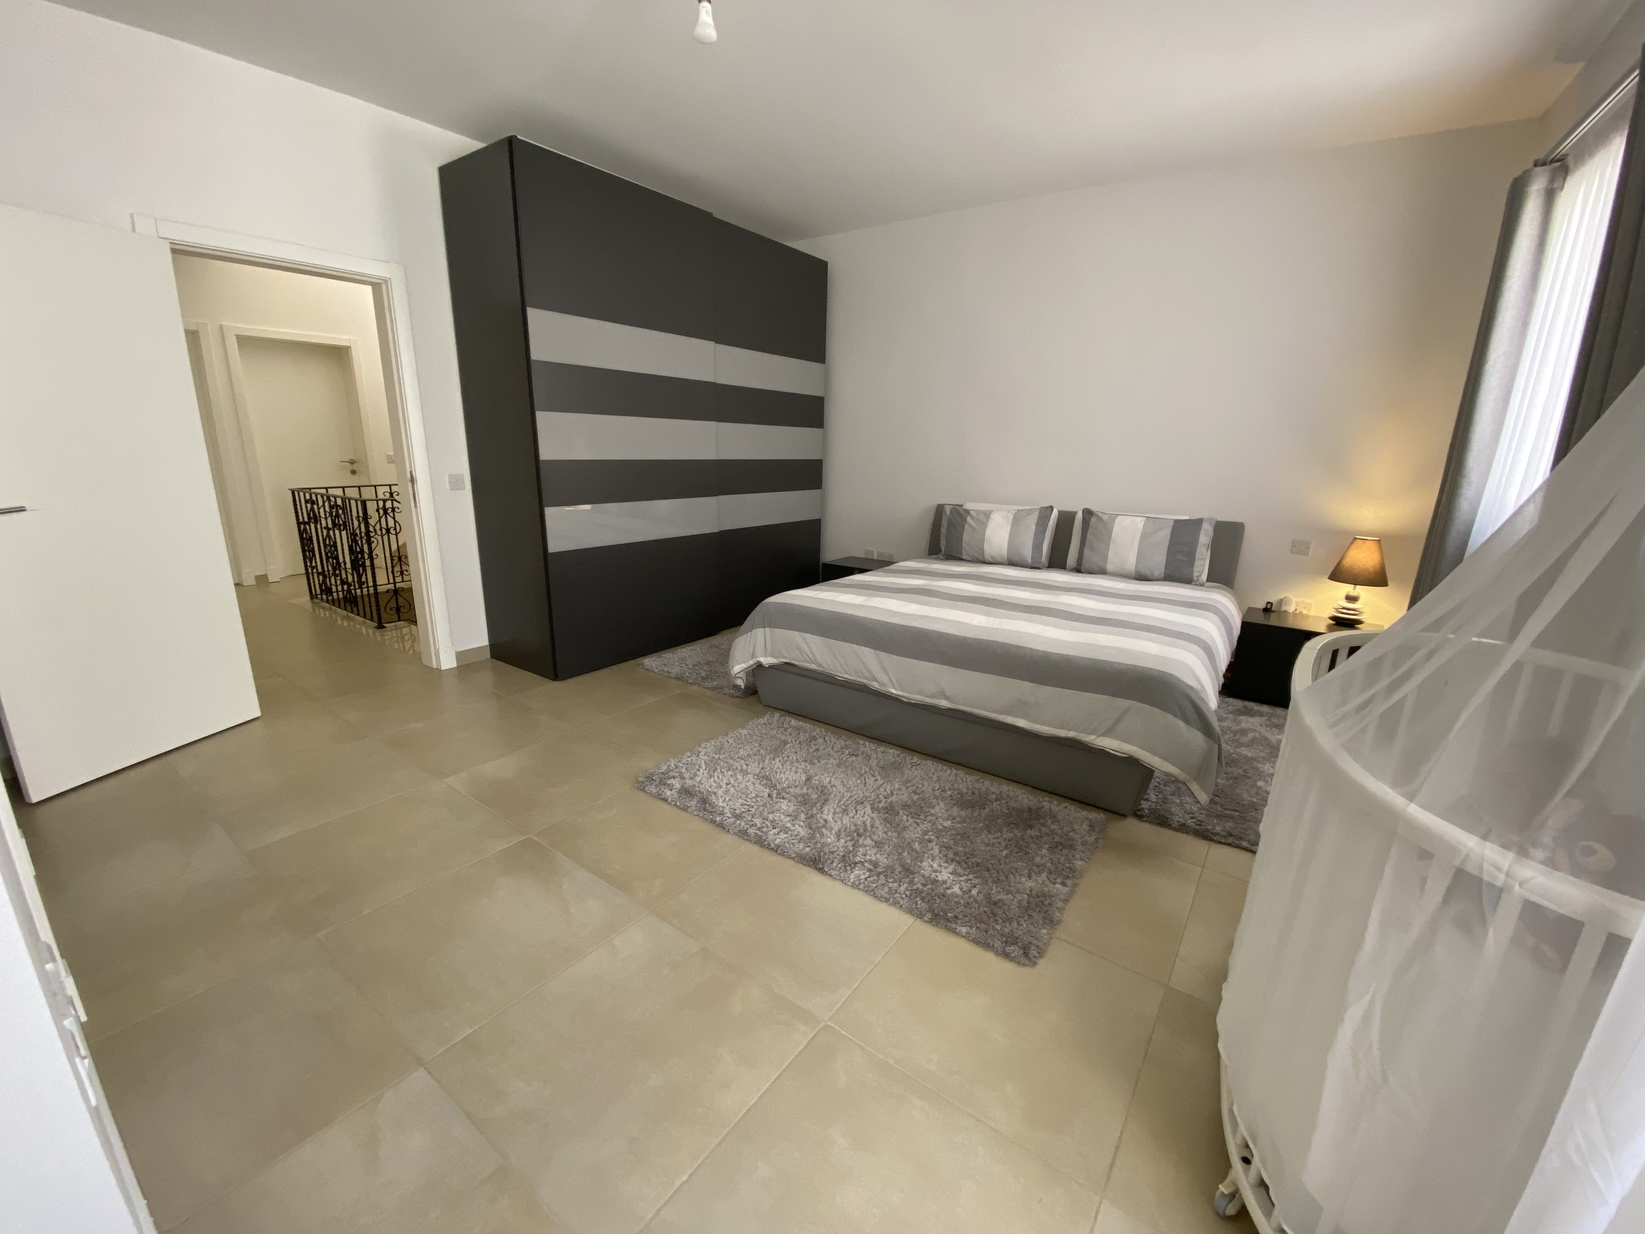 3 bed Terraced House For Sale in Balzan, Balzan - thumb 10